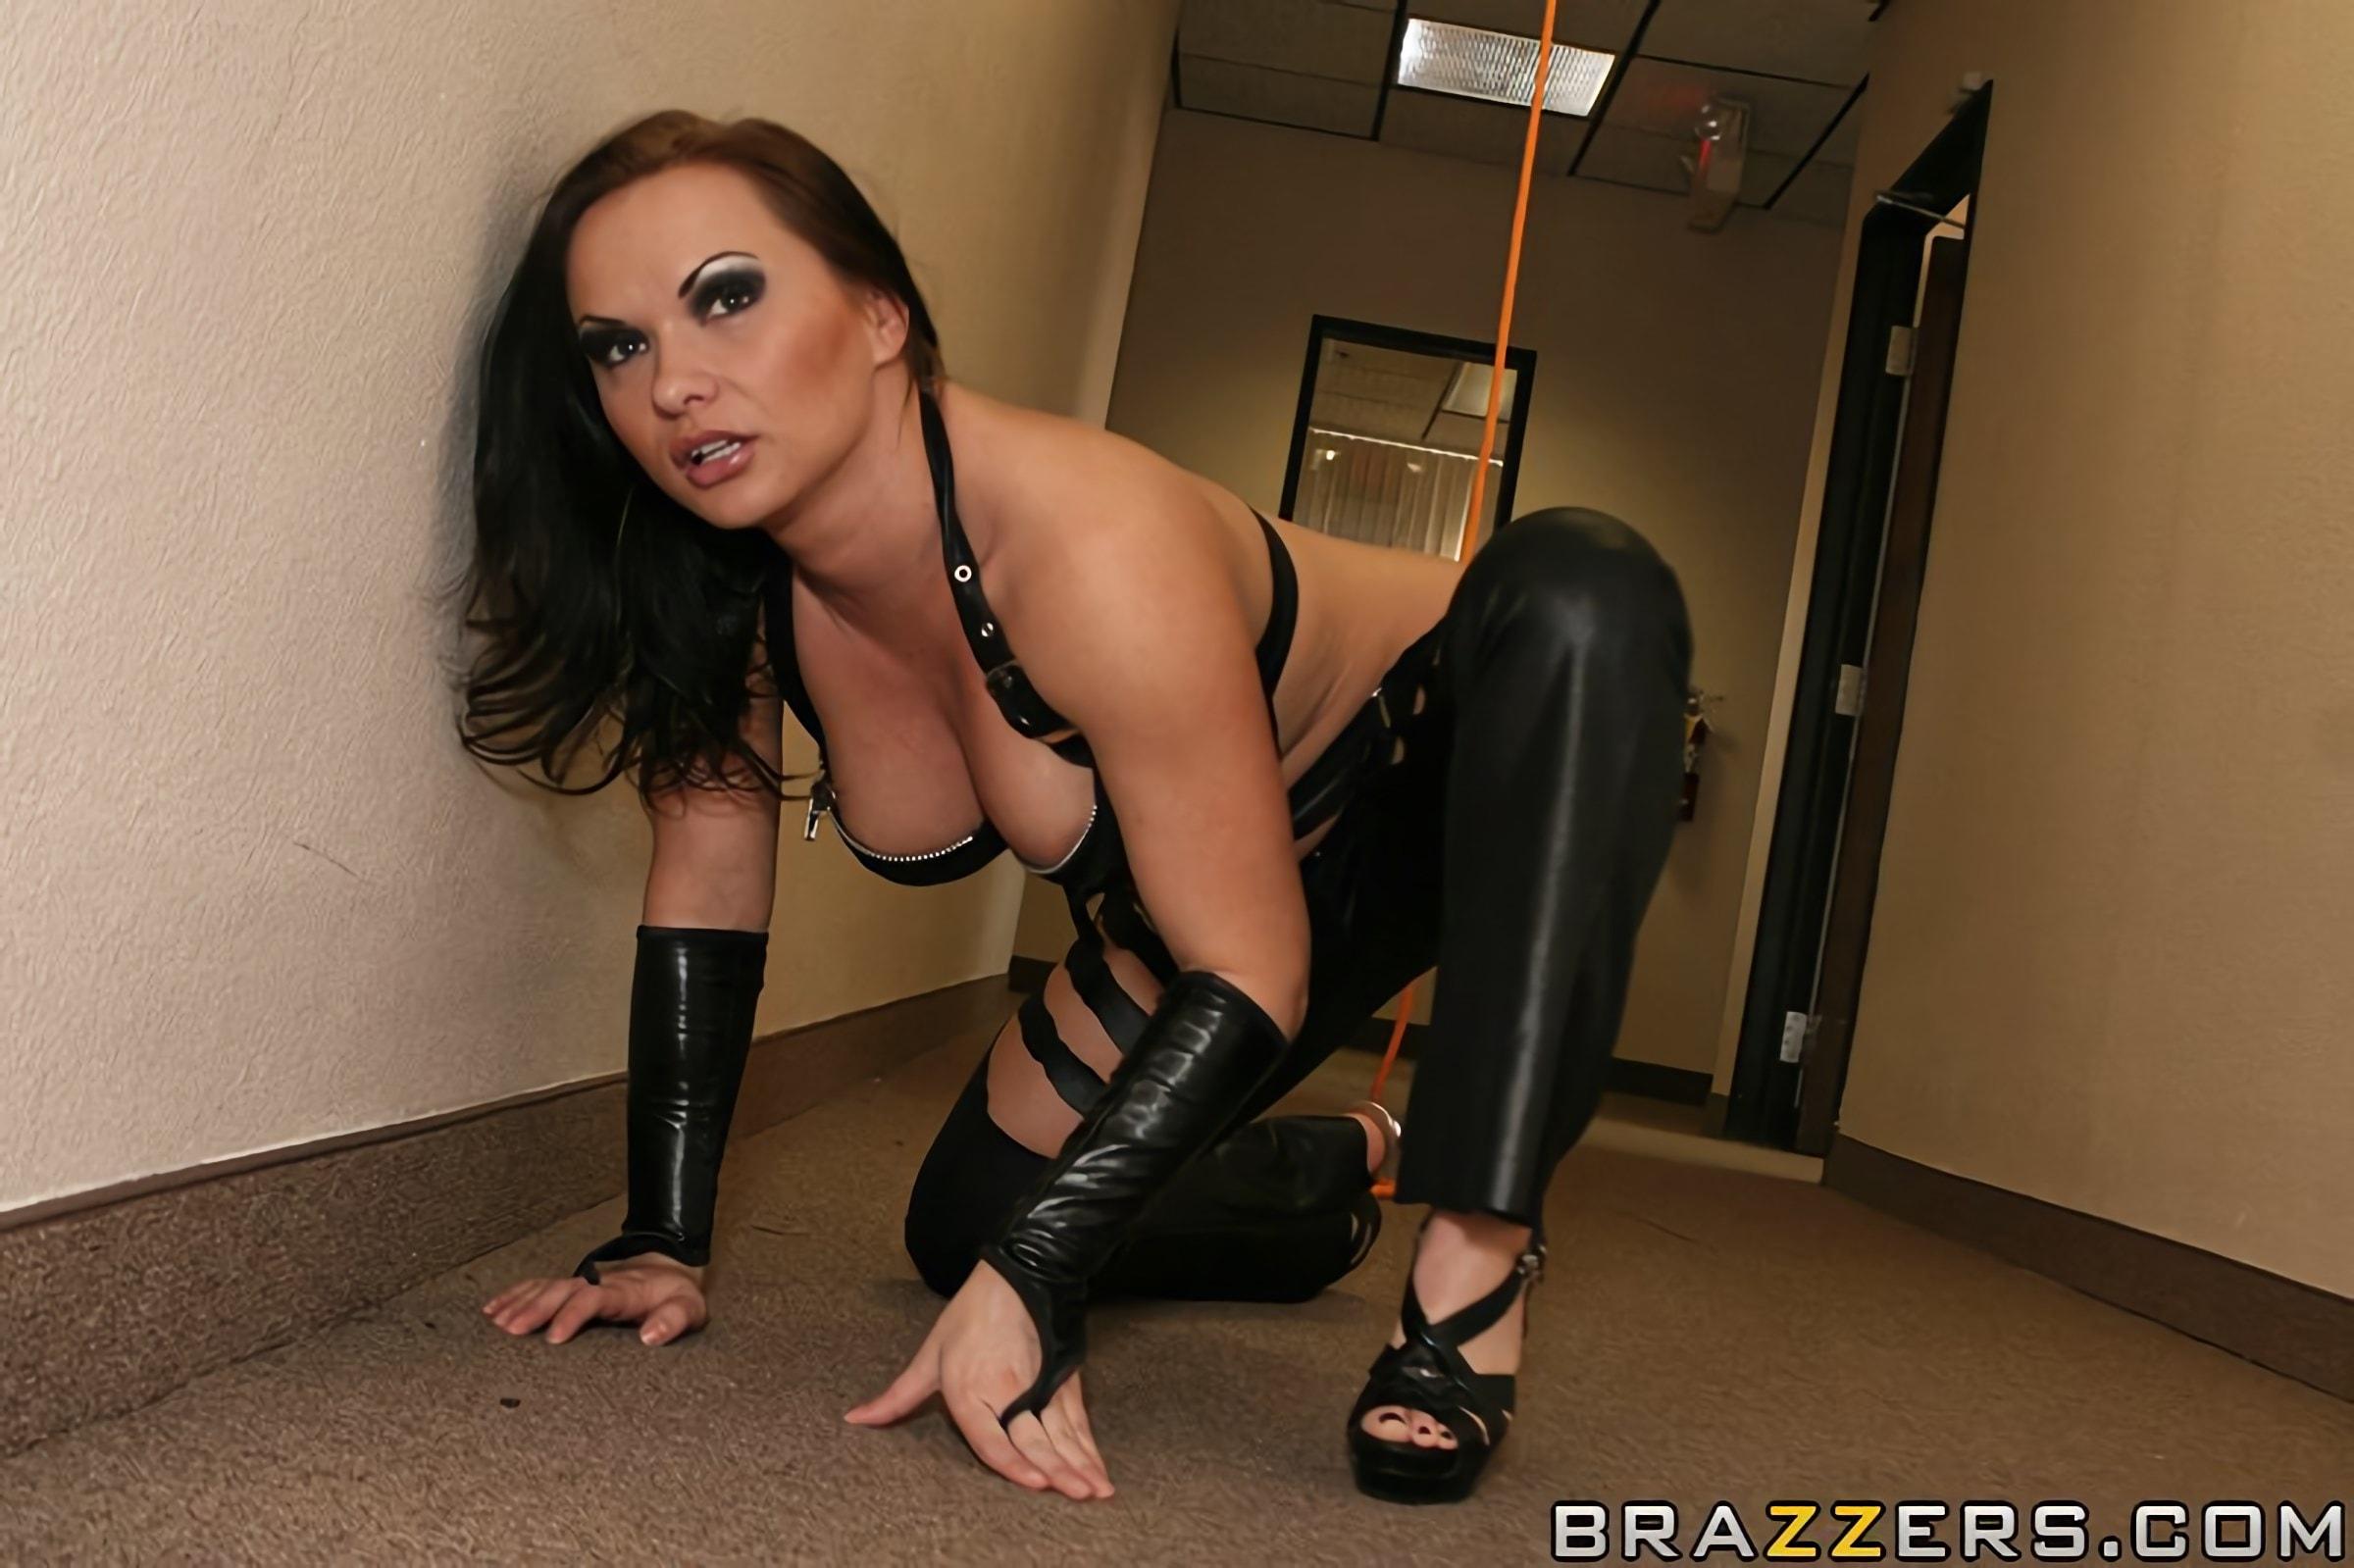 Brazzers 'Big Treasure Cock In Big Beautiful Asshole' starring Katja Kassin (Photo 5)